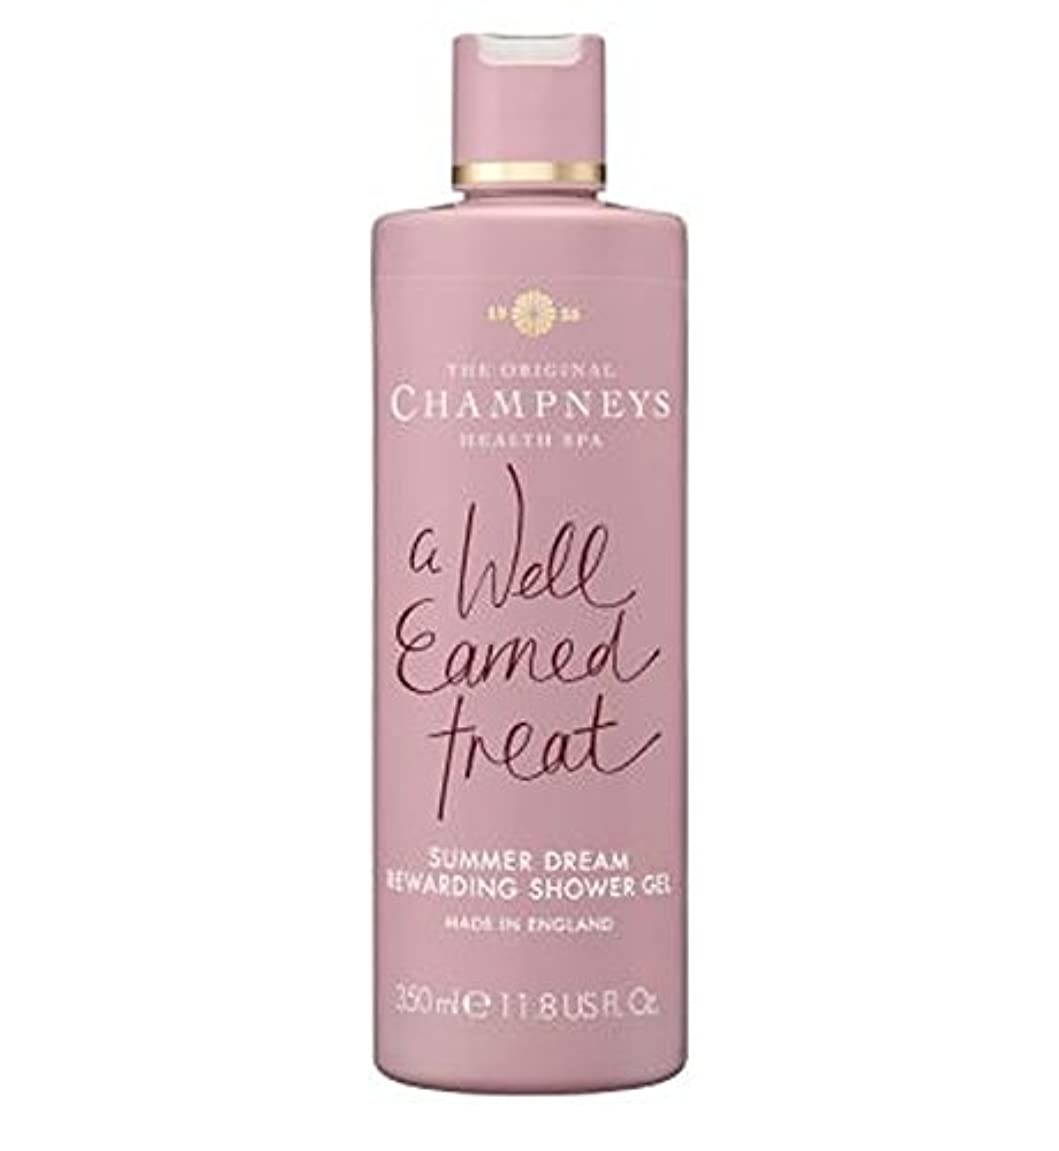 Champneys Summer Dream Rewarding Shower Gel 350ml - チャンプニーズの夏の夢やりがいのシャワージェル350ミリリットル (Champneys) [並行輸入品]